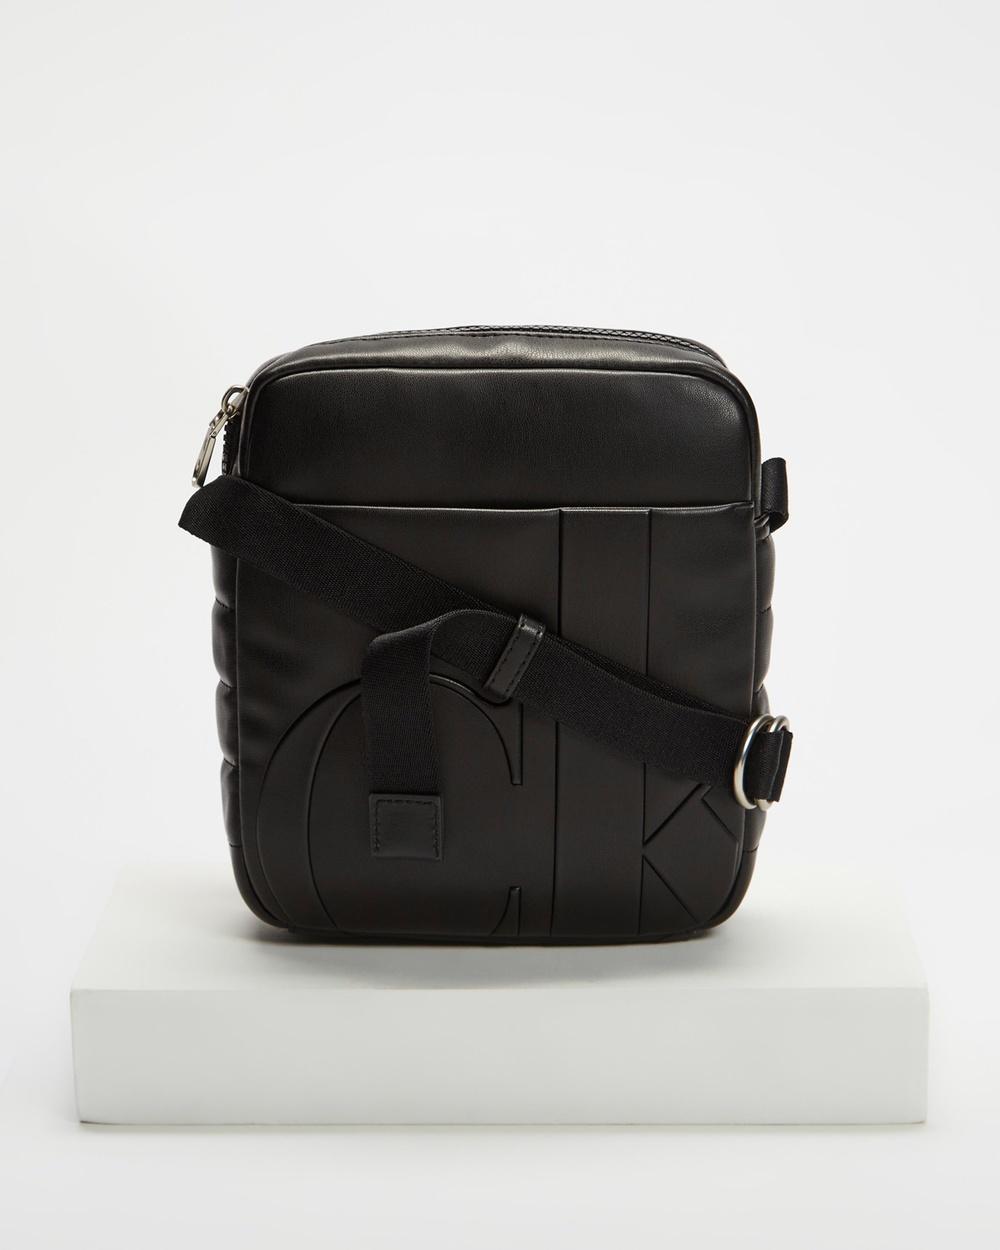 Calvin Klein Jeans Micro Reporter Bags Black Australia